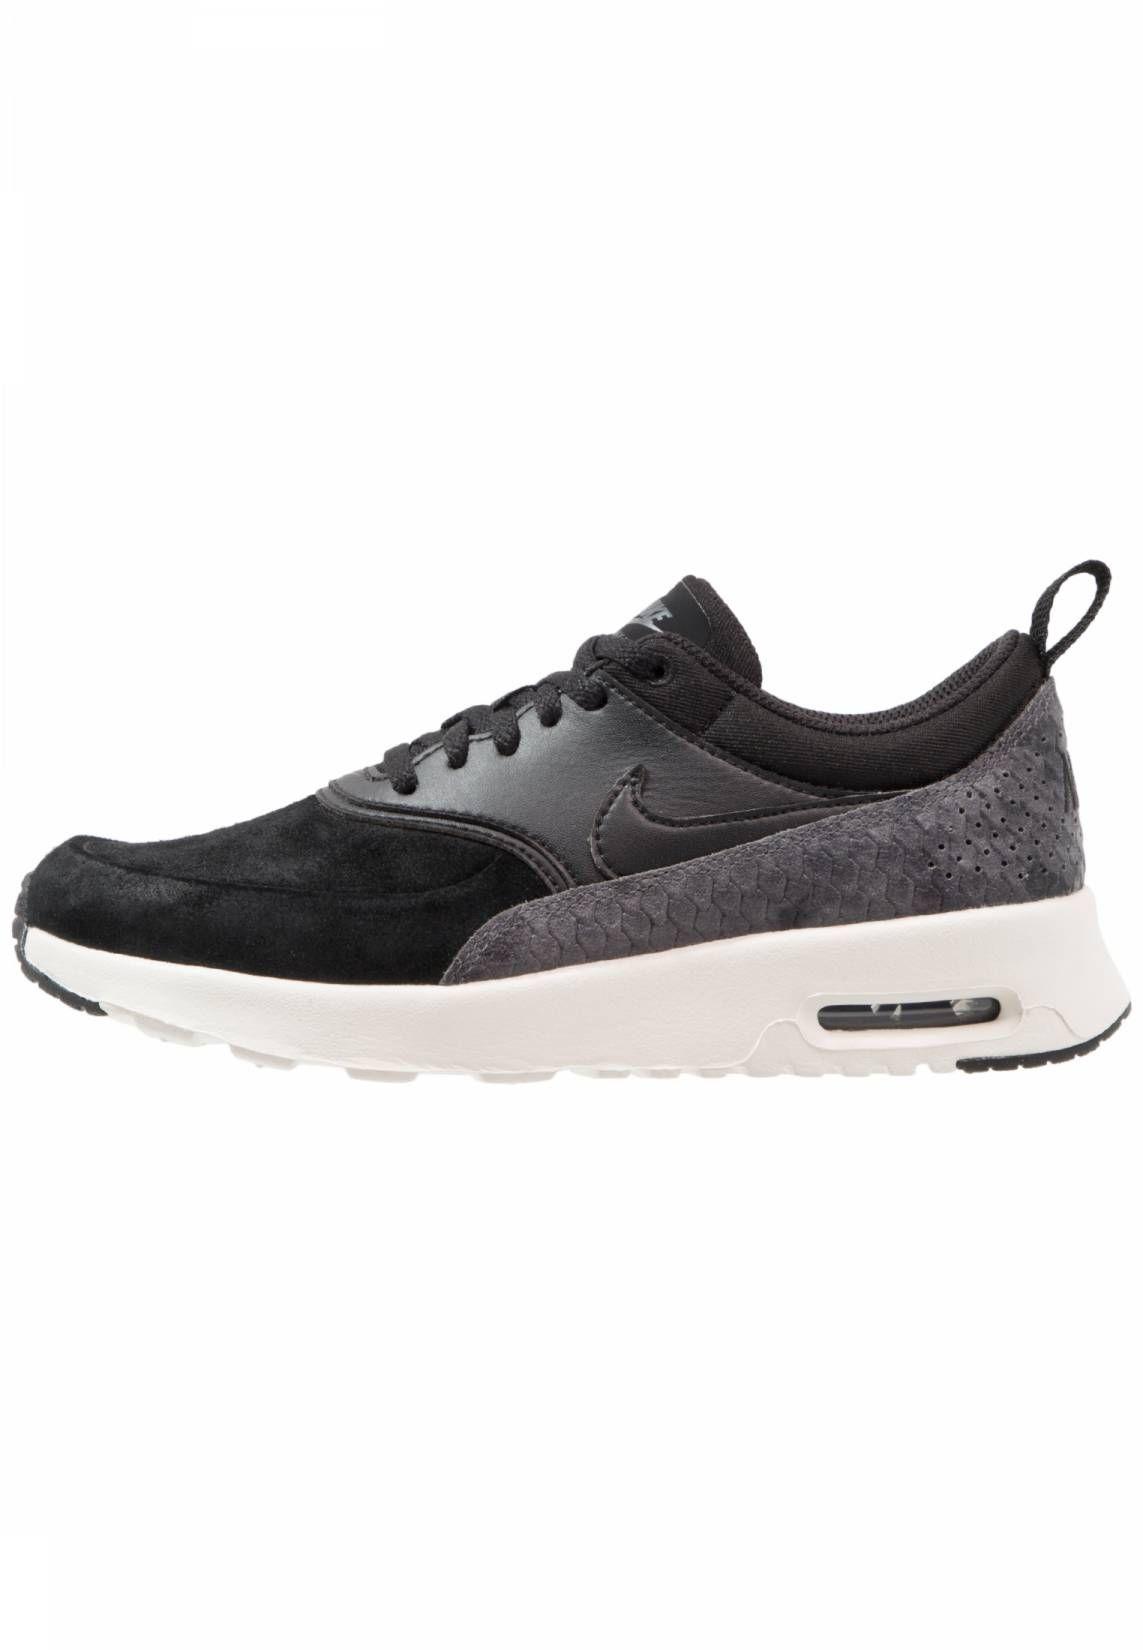 premium selection c04bf cdc55 Nike Sportswear. AIR MAX THEA PRM - Baskets basses - black dark grey.